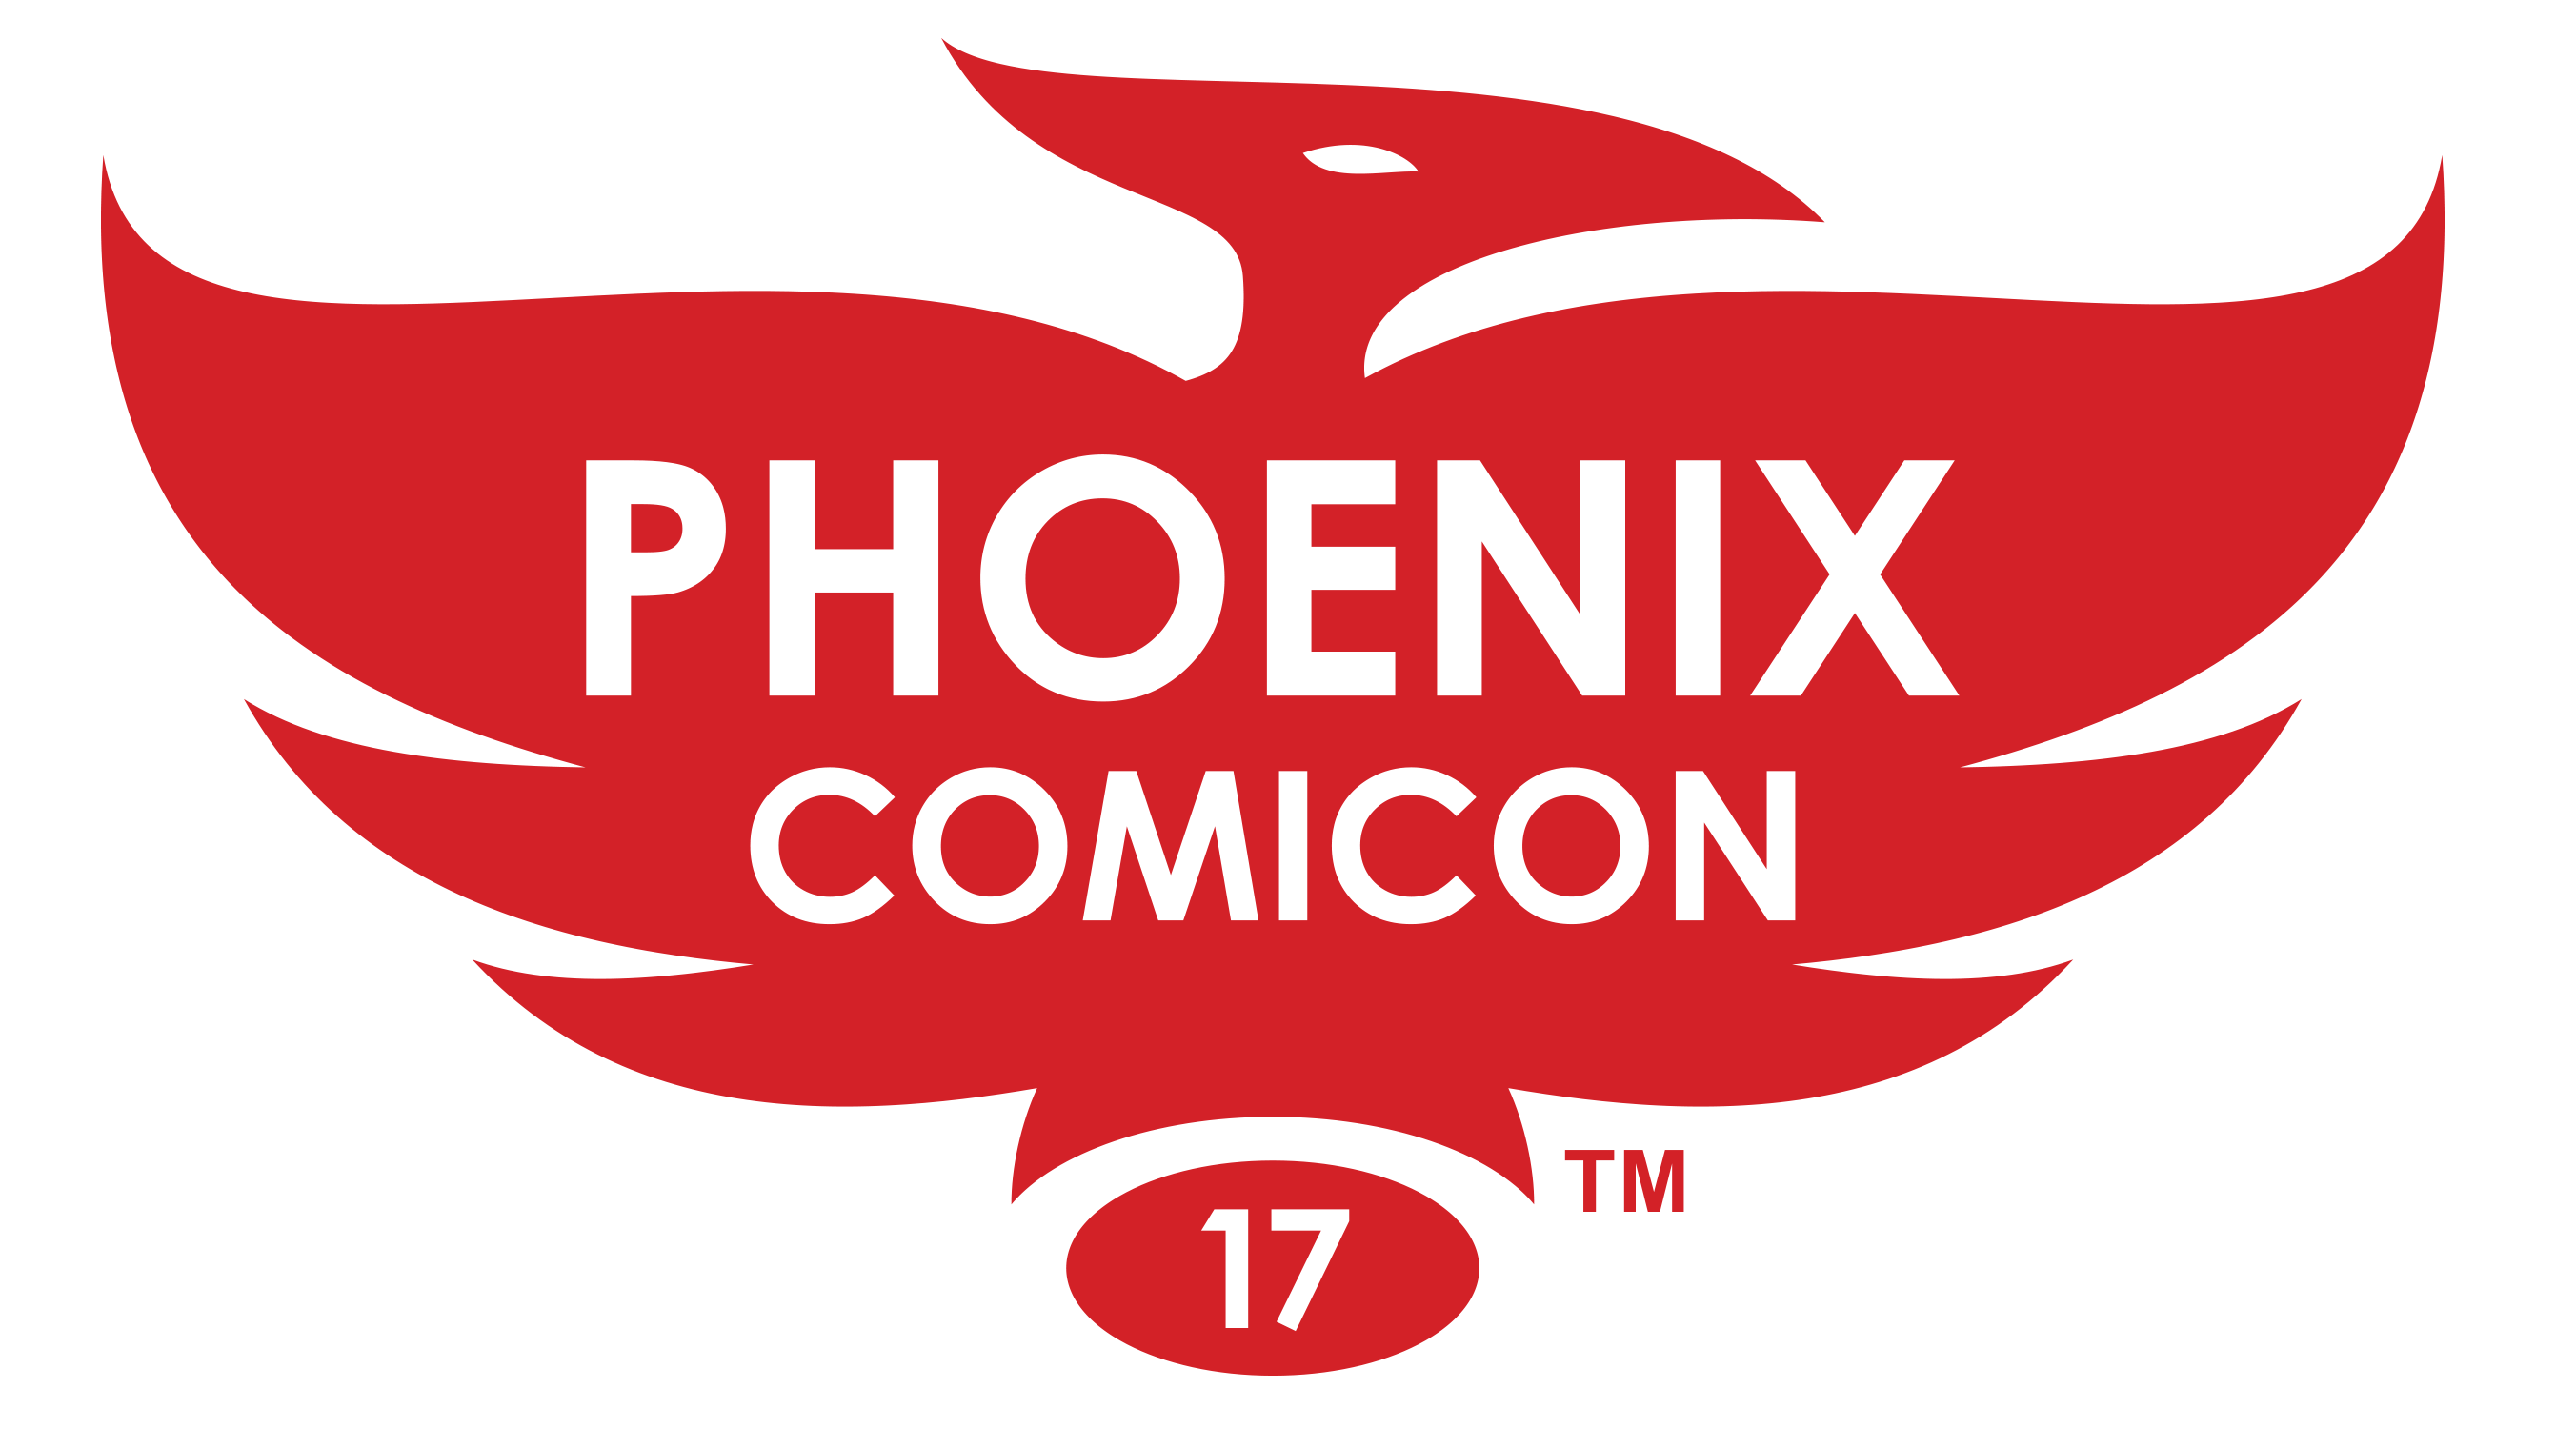 Phoenix Comicon 2017 Logo